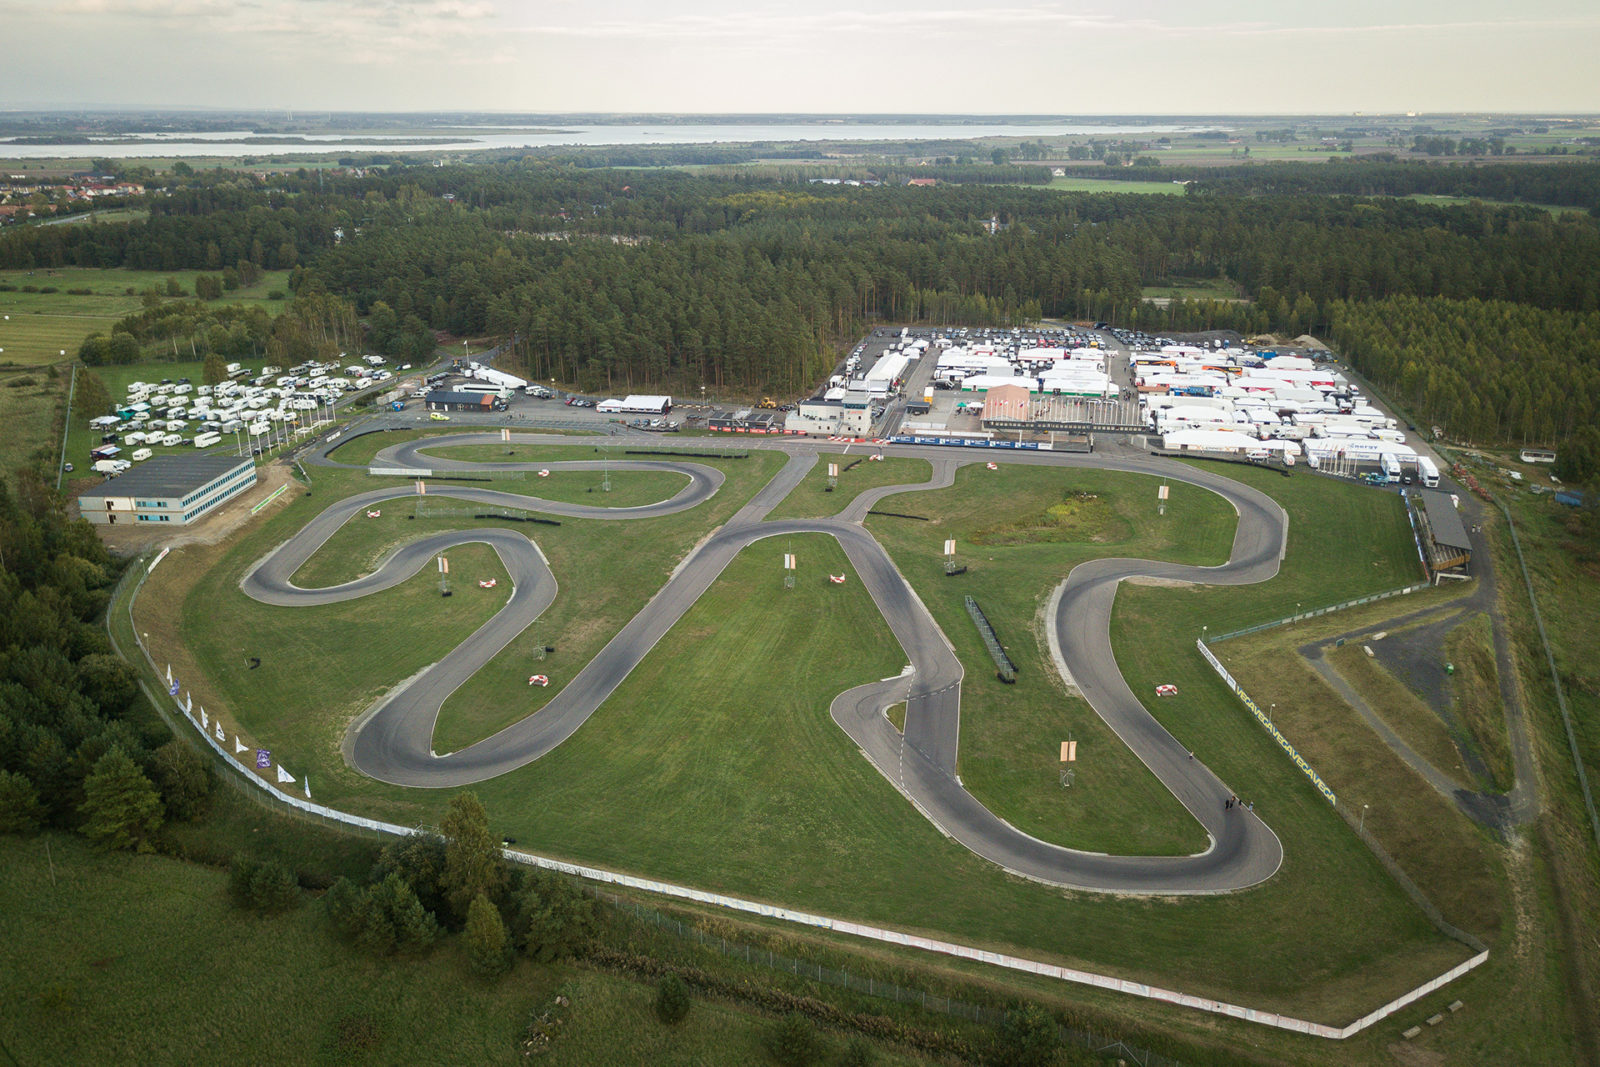 Aerial of the Kristianstad karting circuit